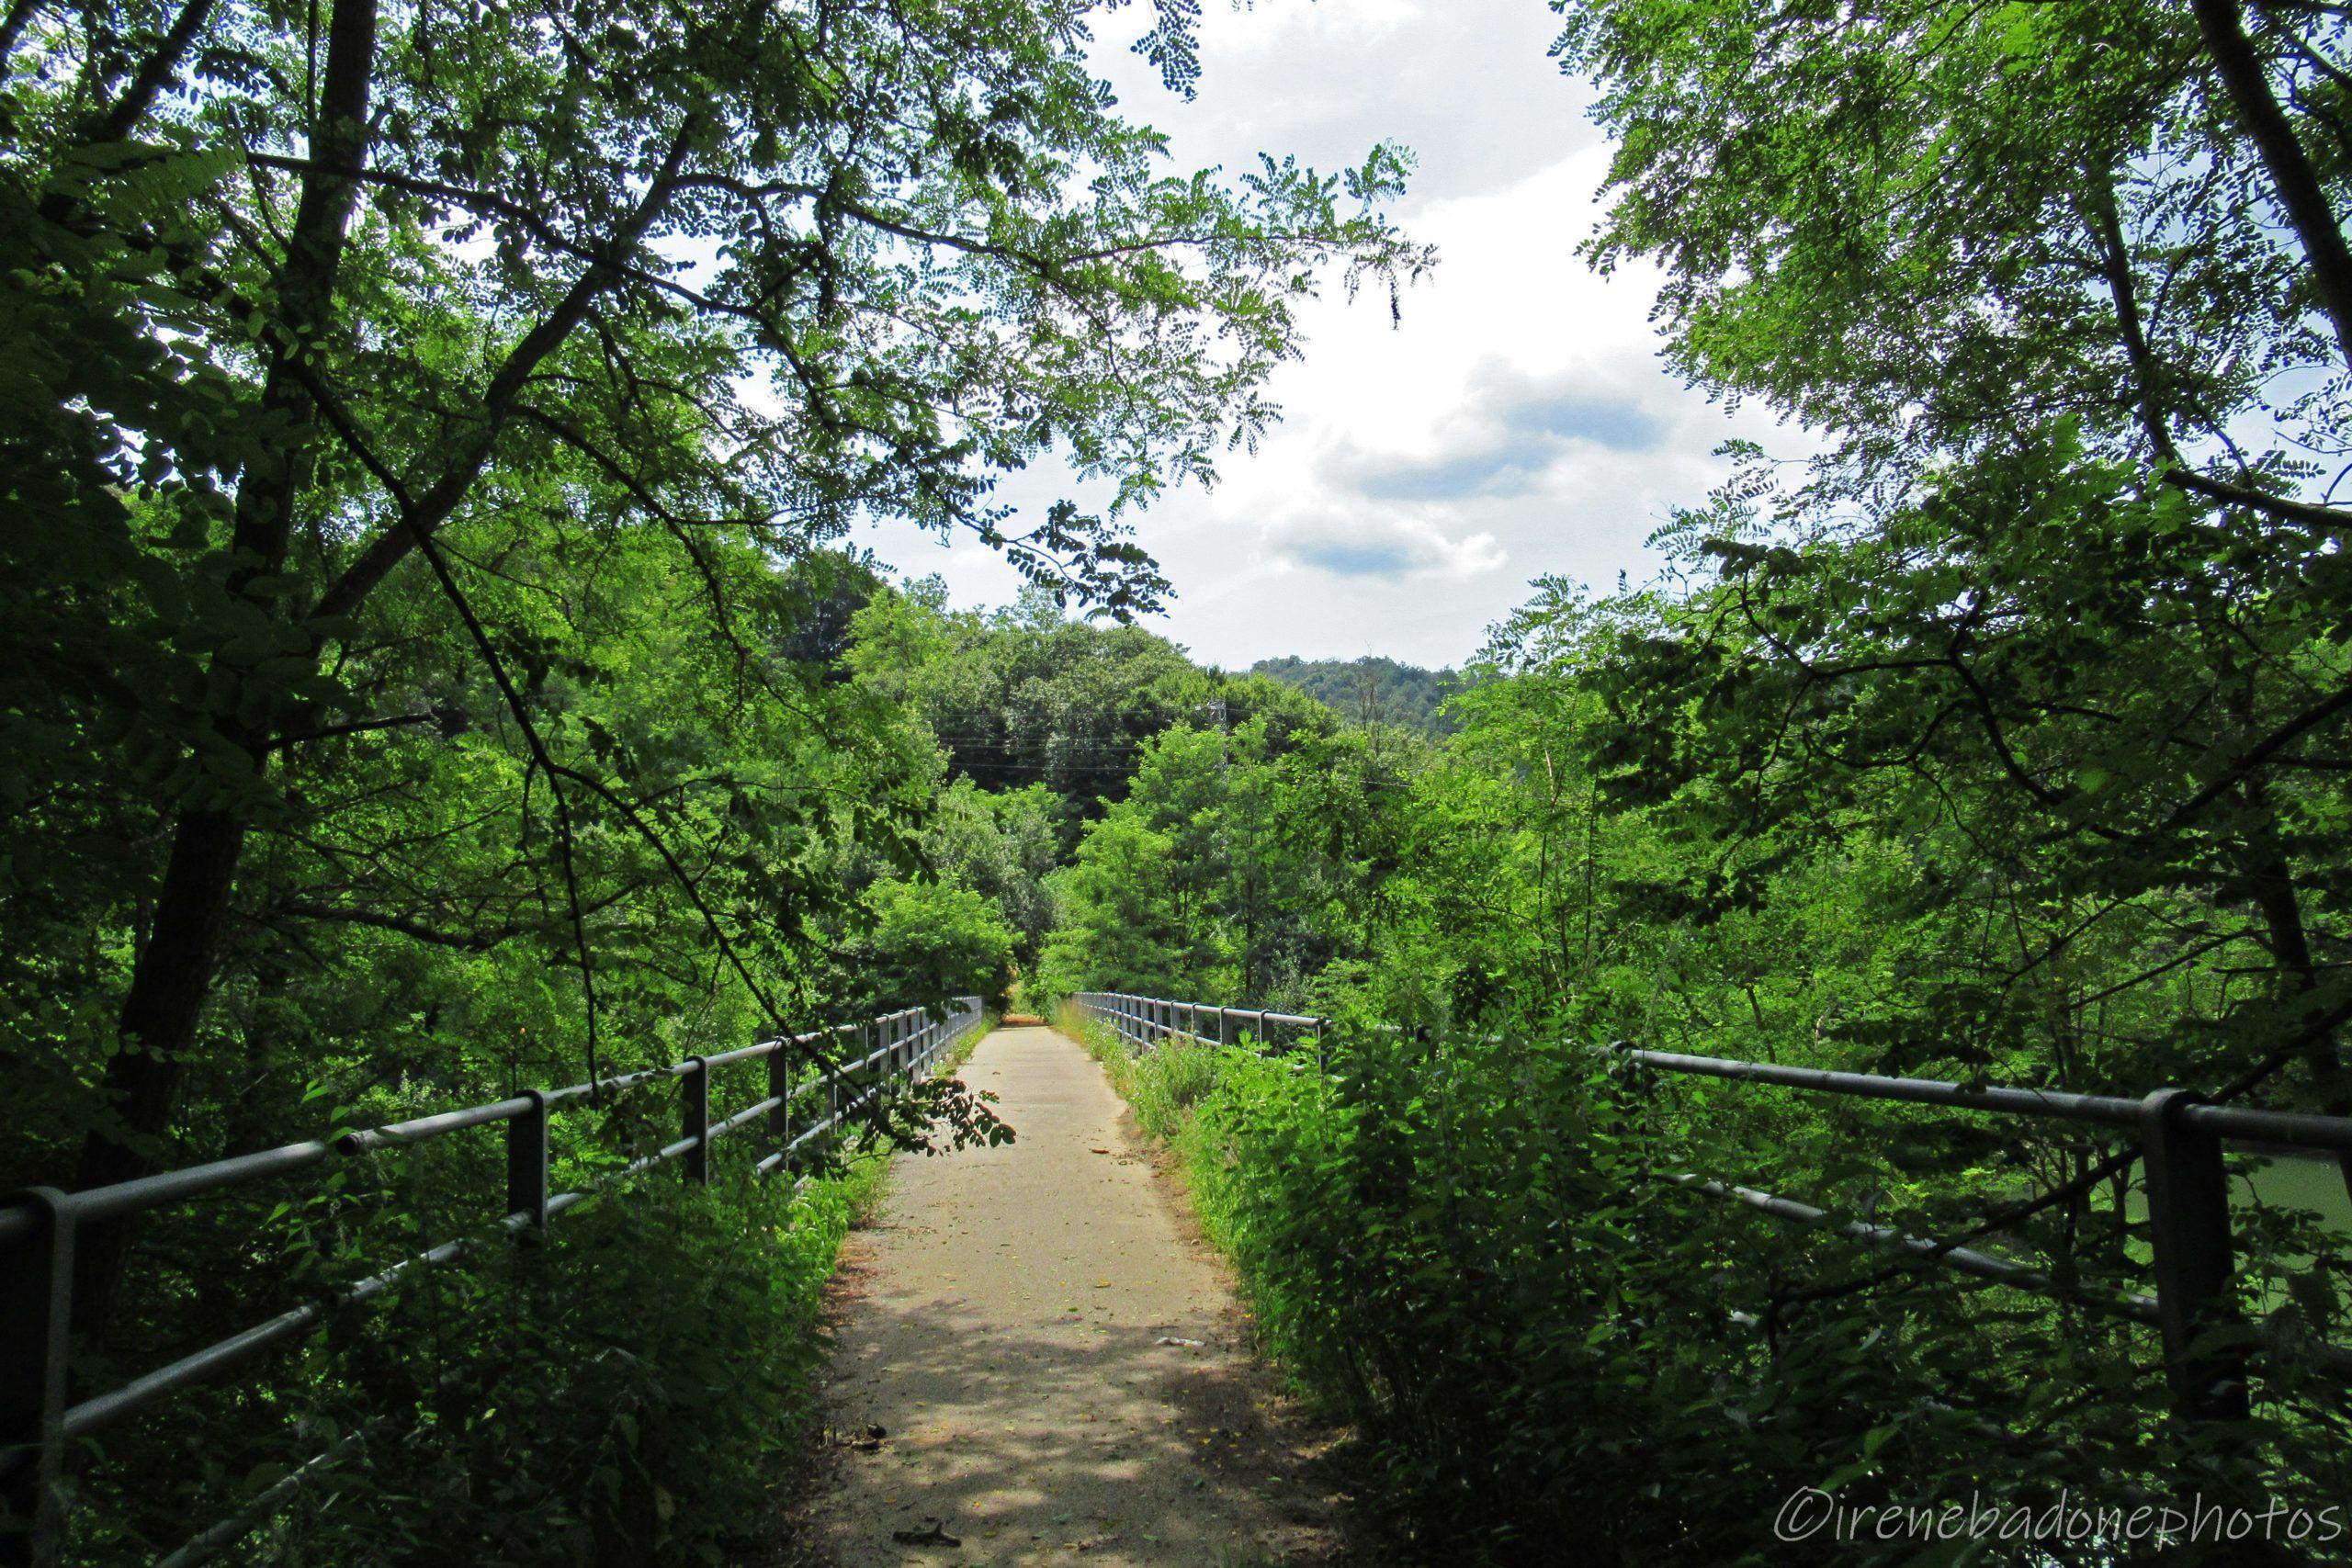 The bridge that crosses the lake of Ingagna